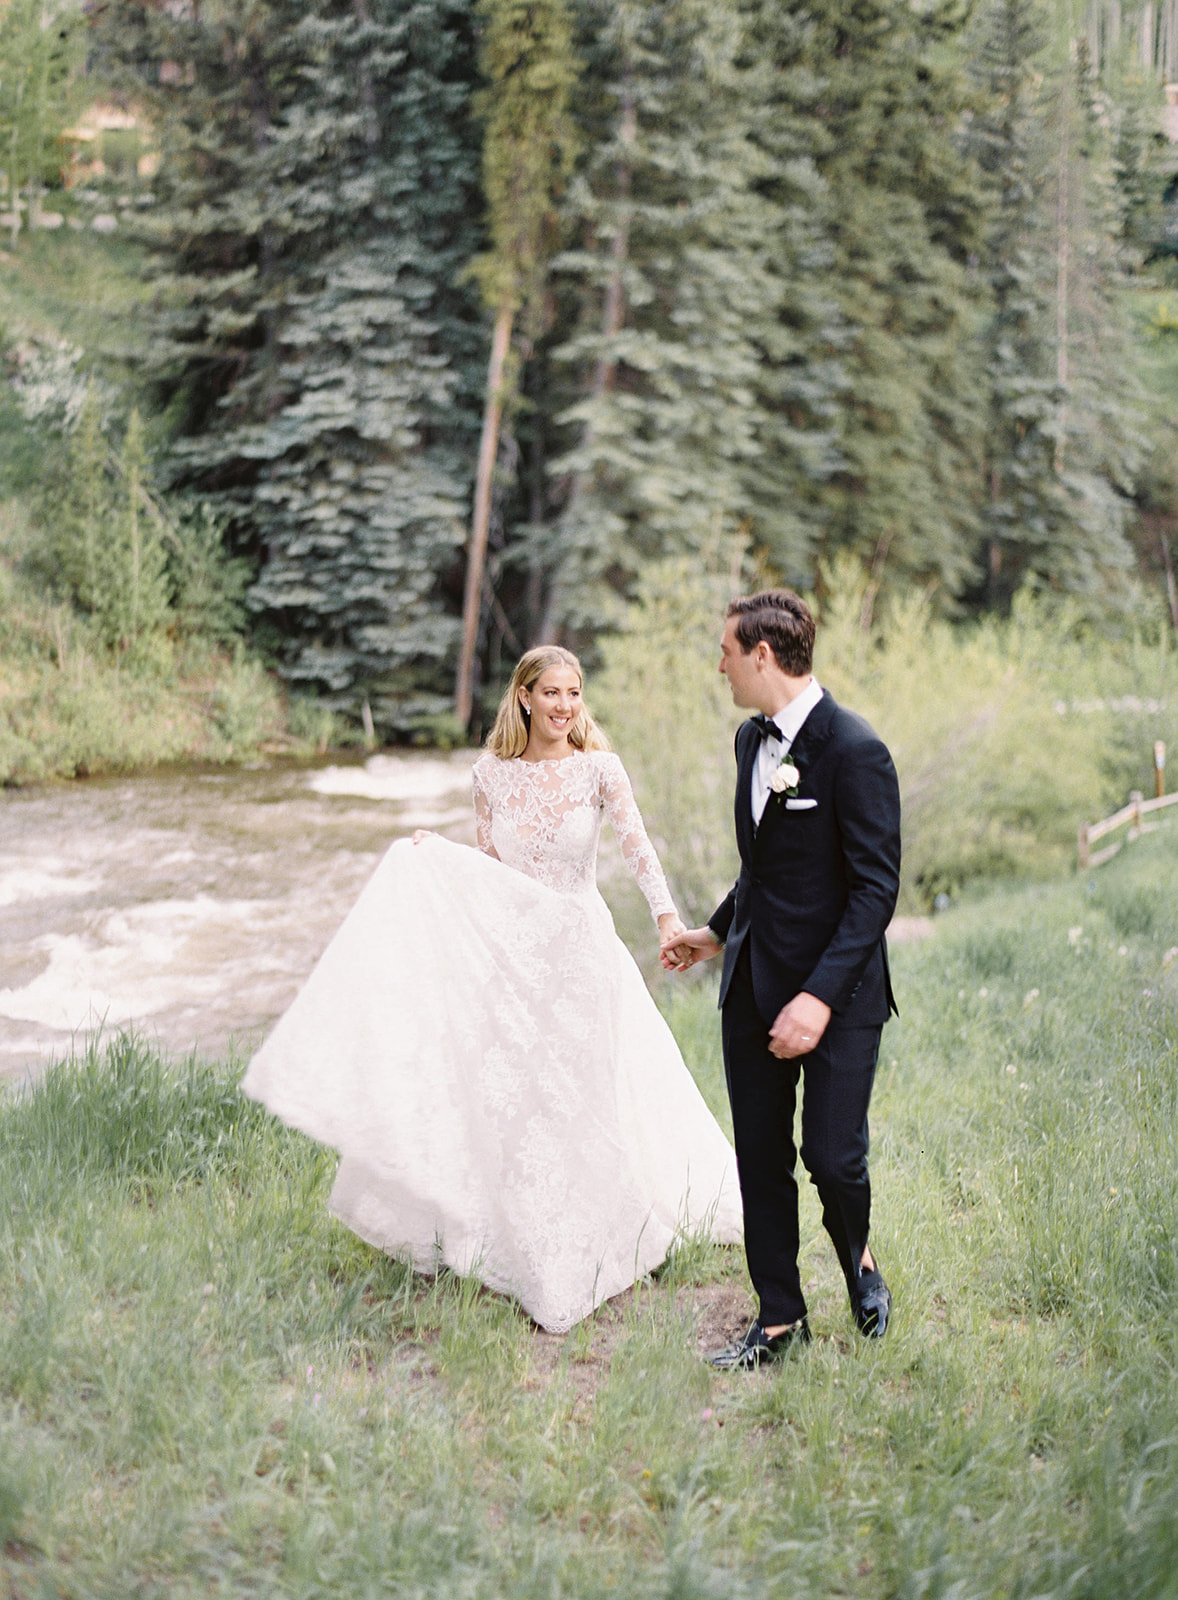 bride groom walk through woods wedding attire